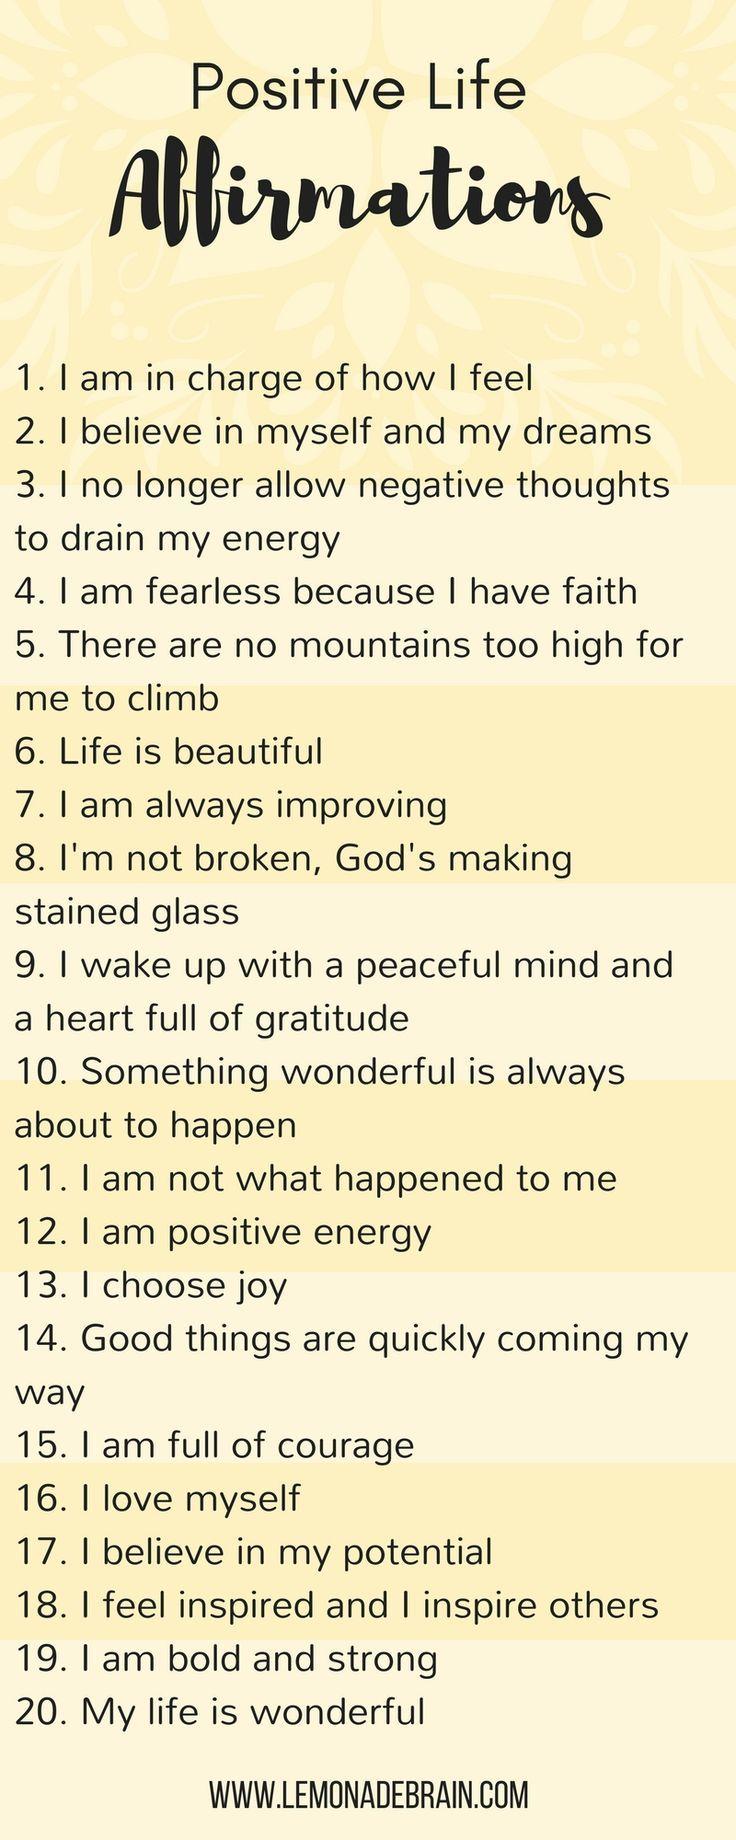 Positive life affirmations